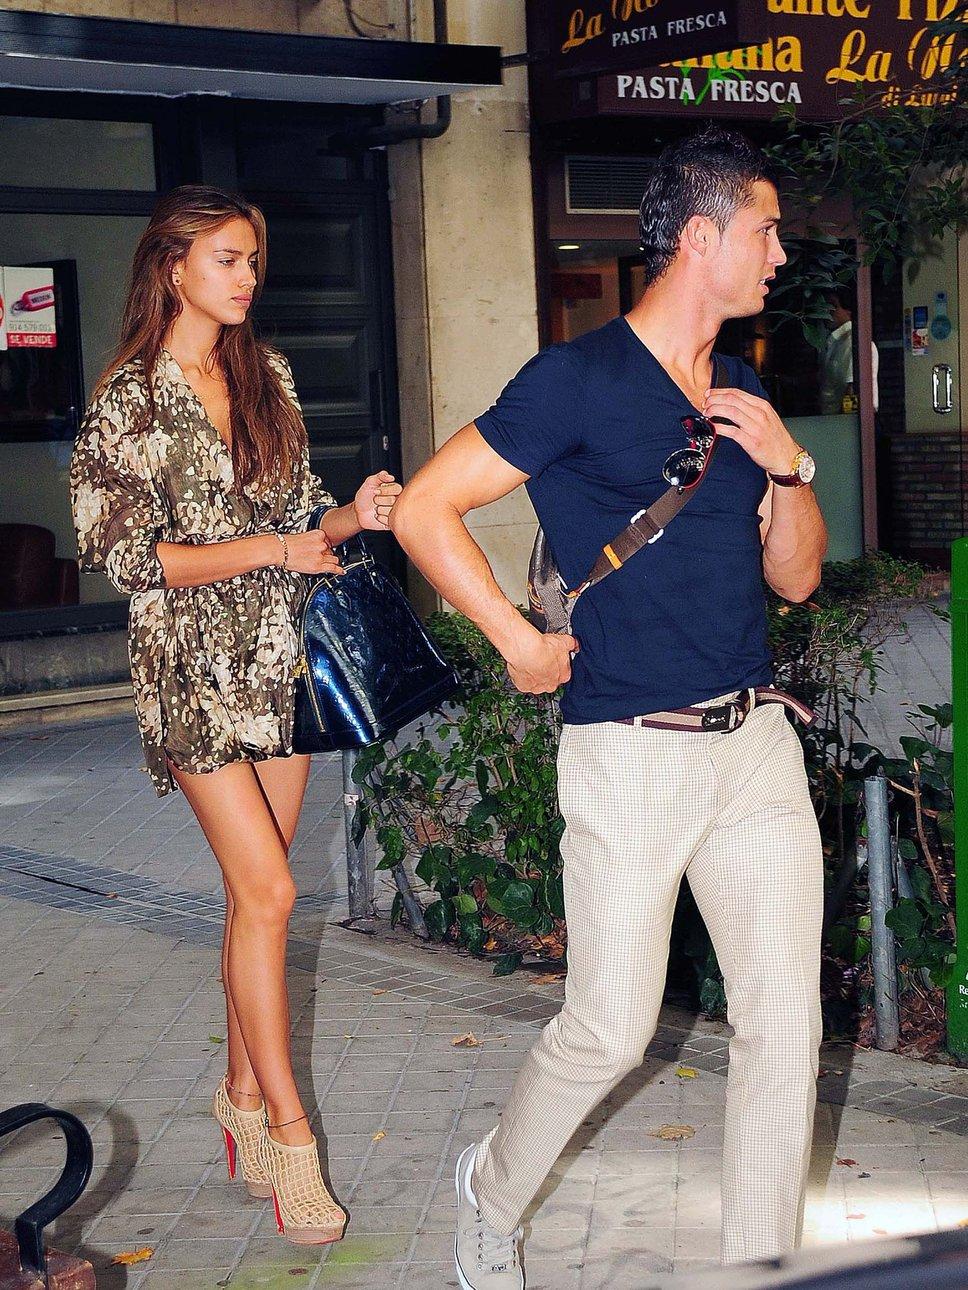 Cris Ronaldo bên cô bạn gái siêu mẫu Irina